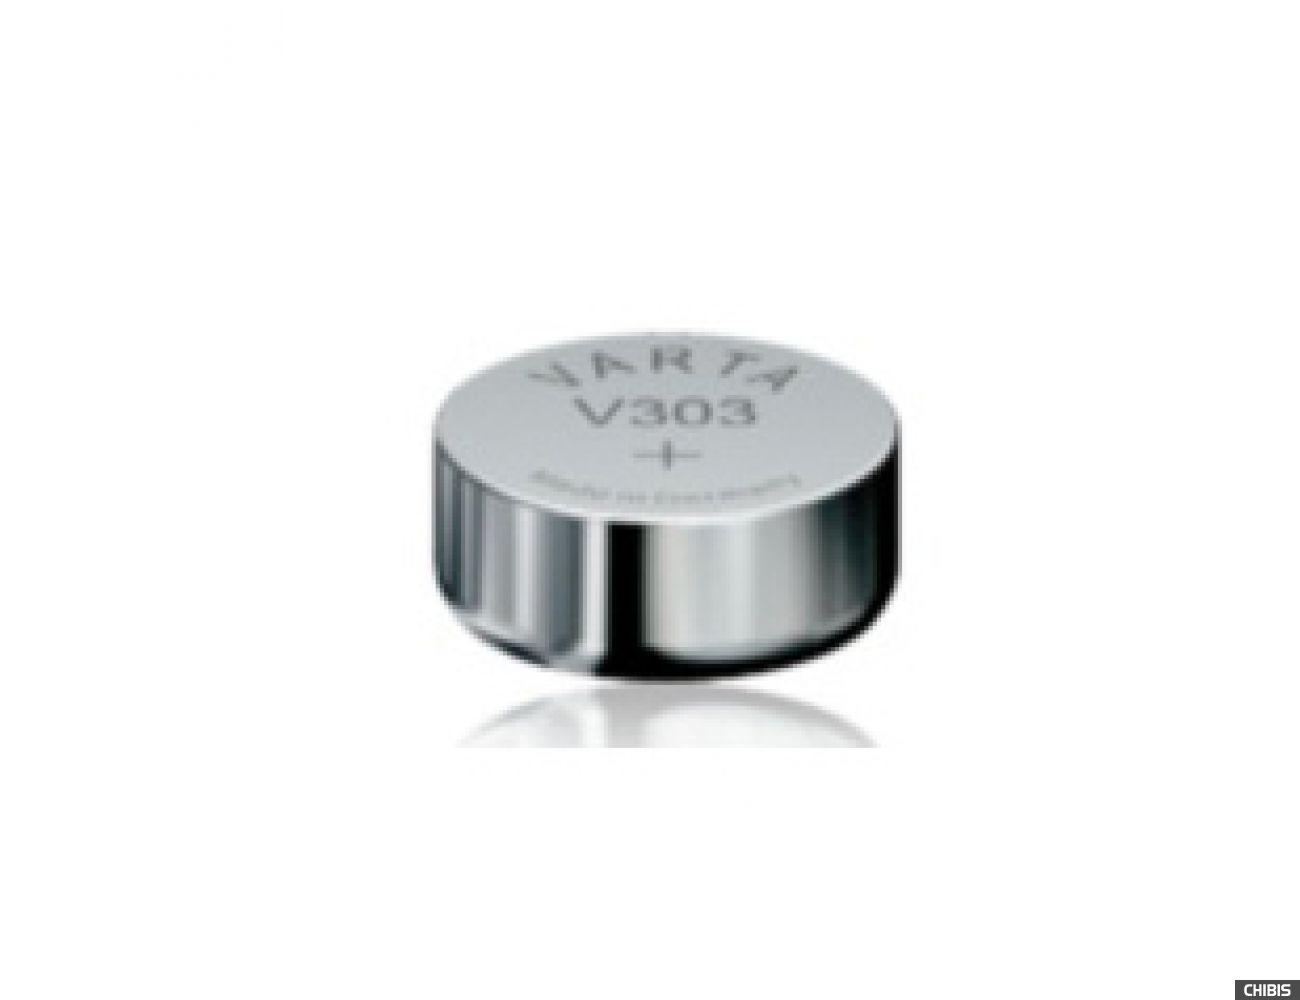 Батарейка Varta V303 (SR44, 170mAh, 1.55V, Оксид Серебра) 00303101111